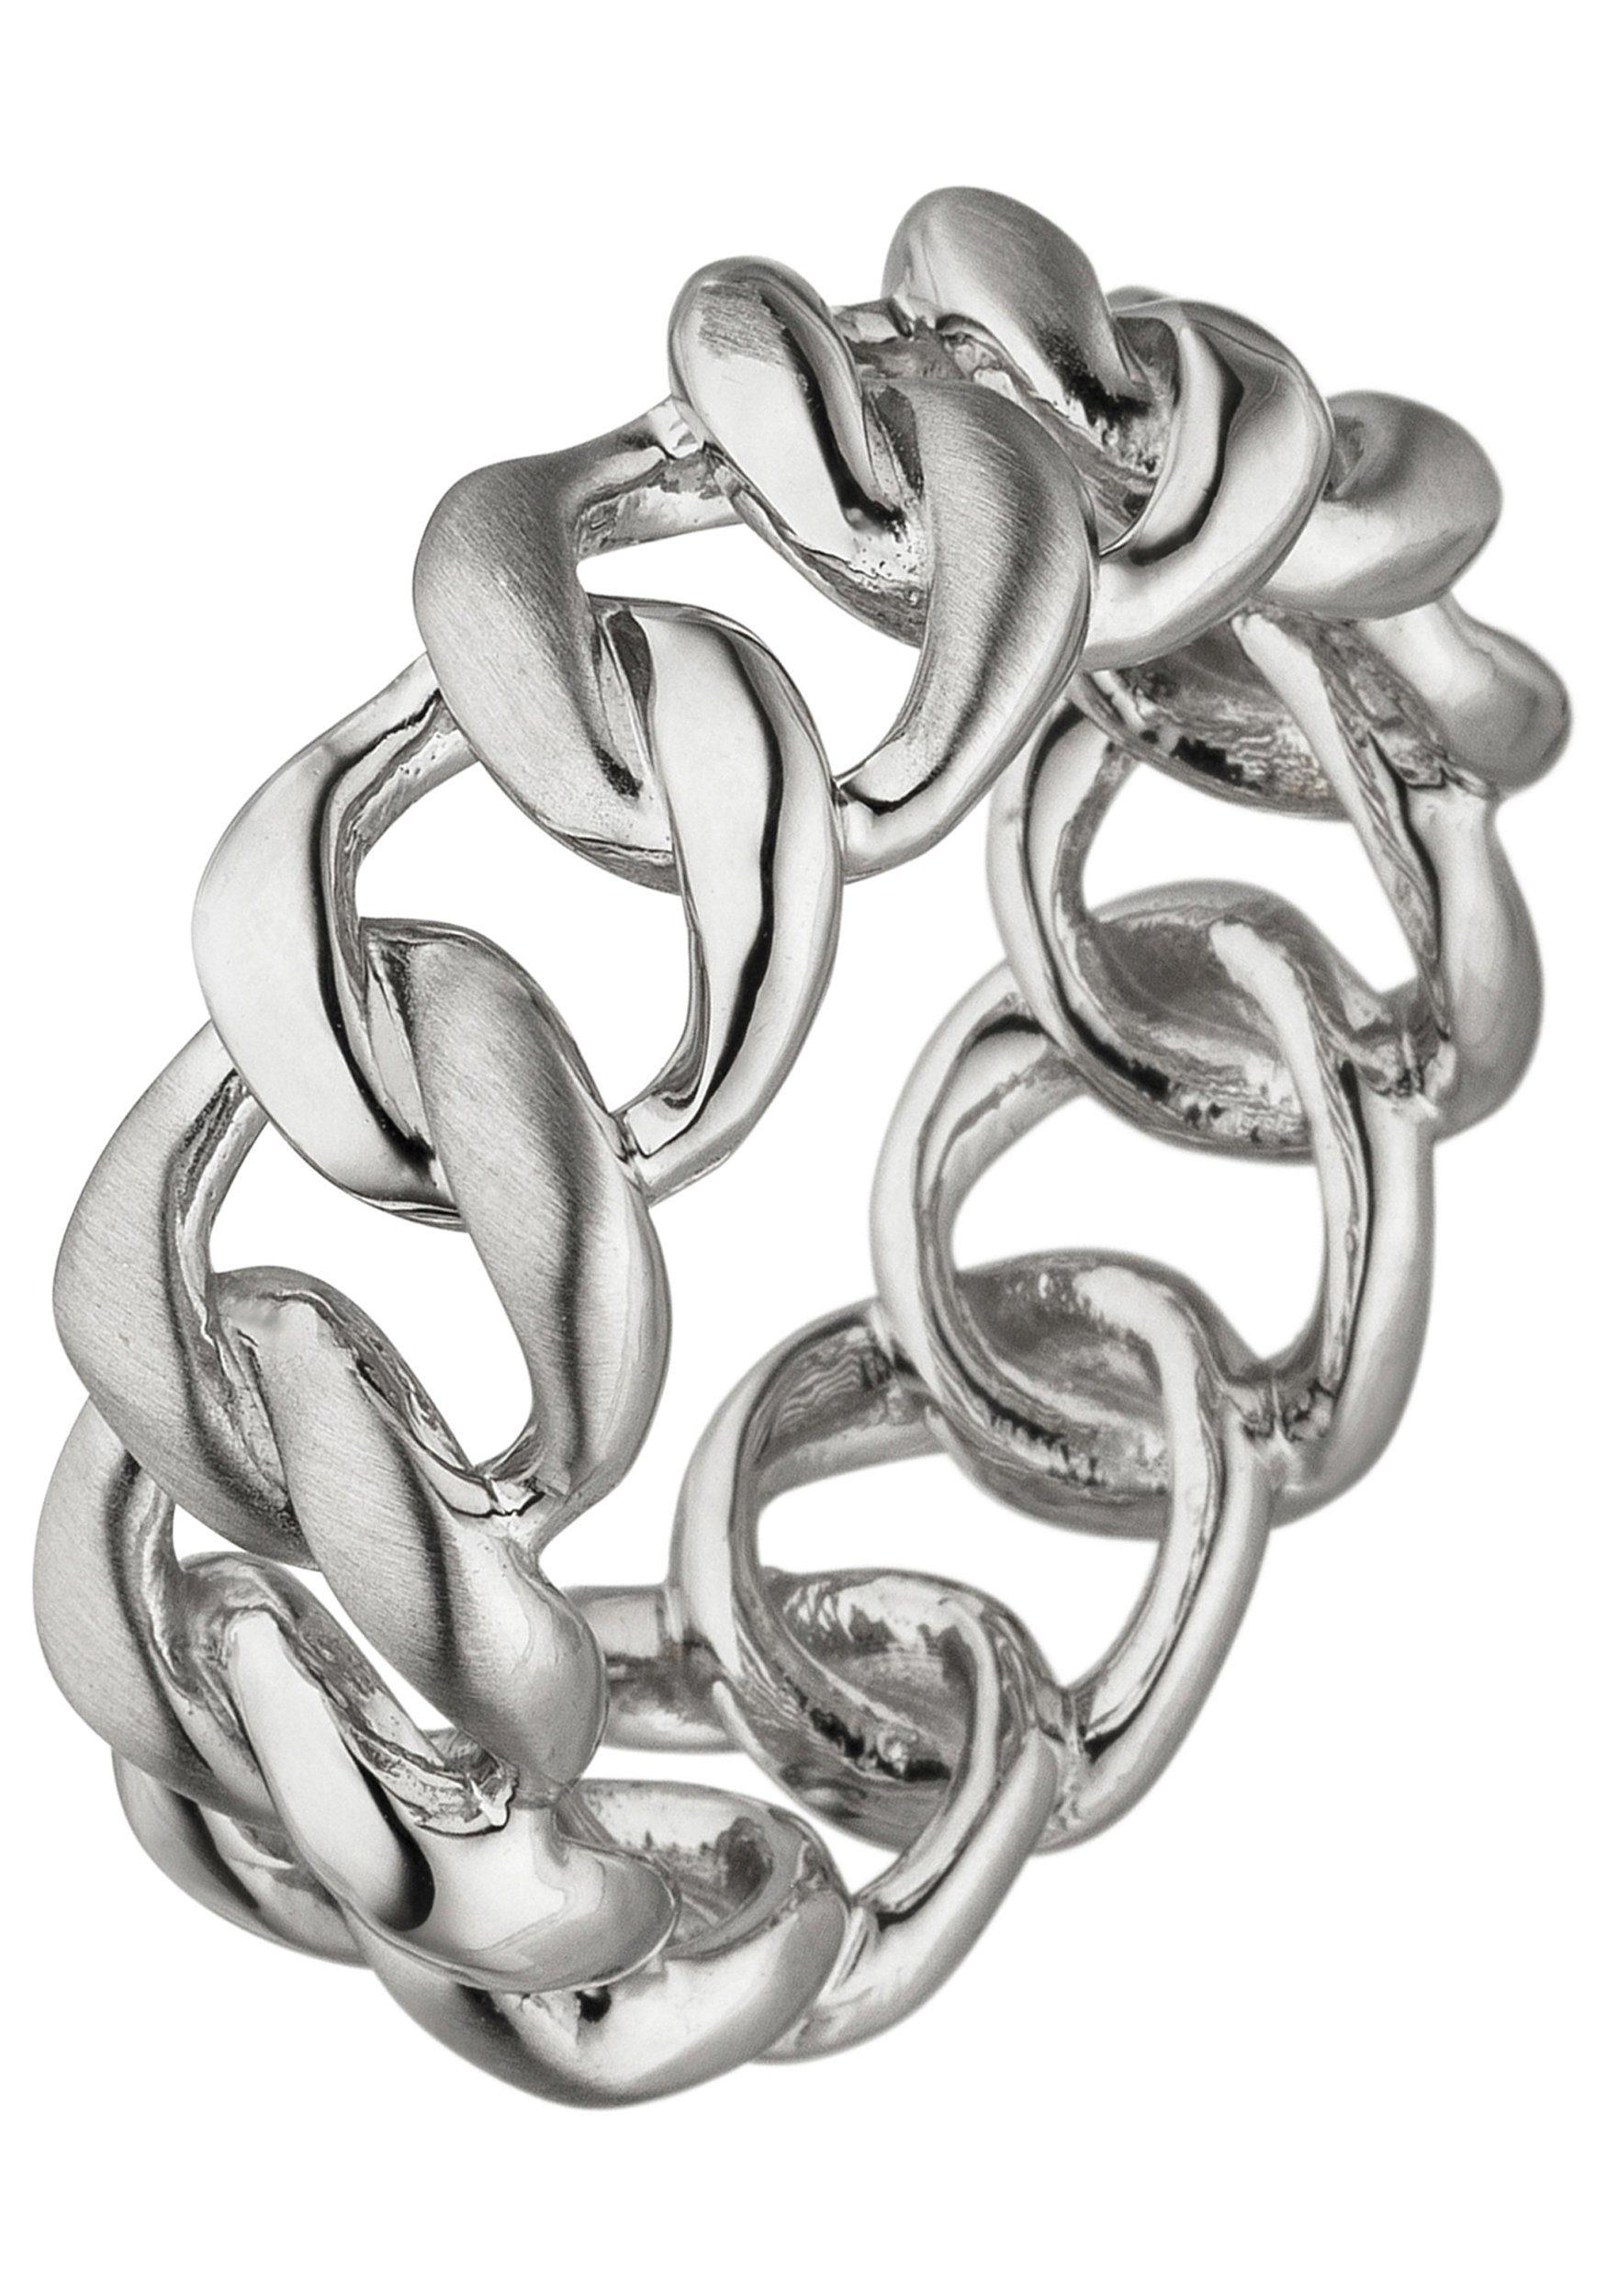 JOBO Fingerring Kettenring 925 Silber kaufen  OTTO